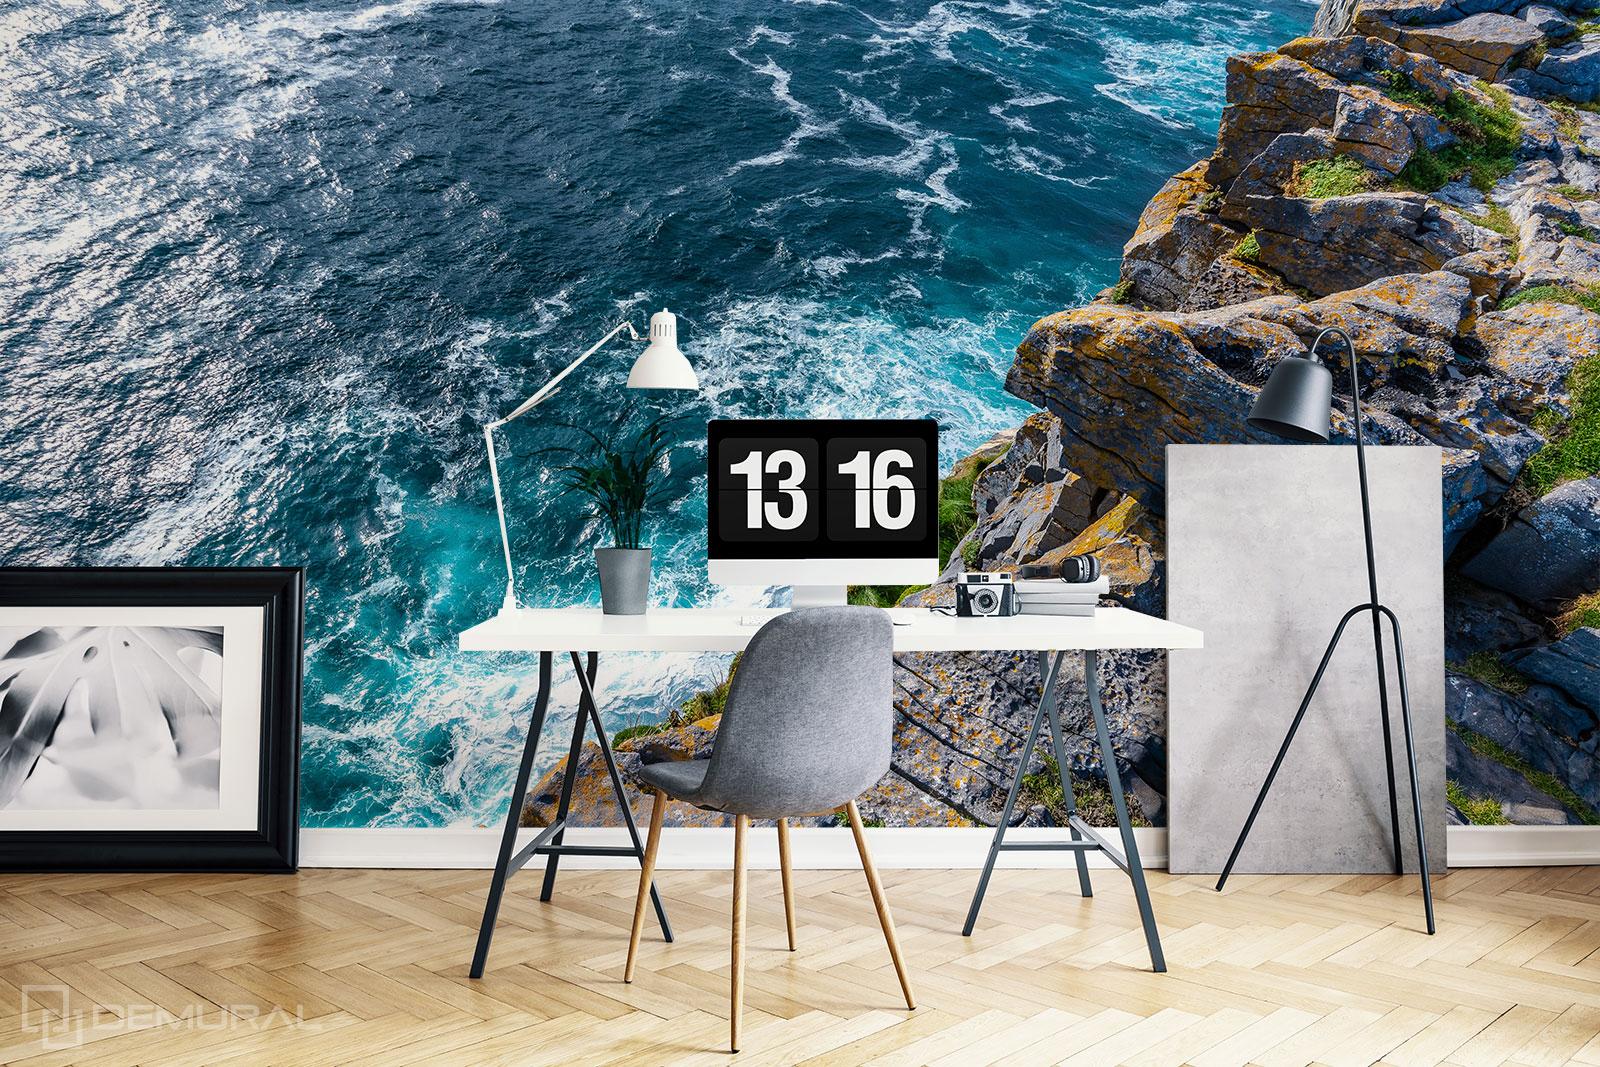 Fototapete Meeresklippen - Fototapete mit dem Meer für Büro - Demural